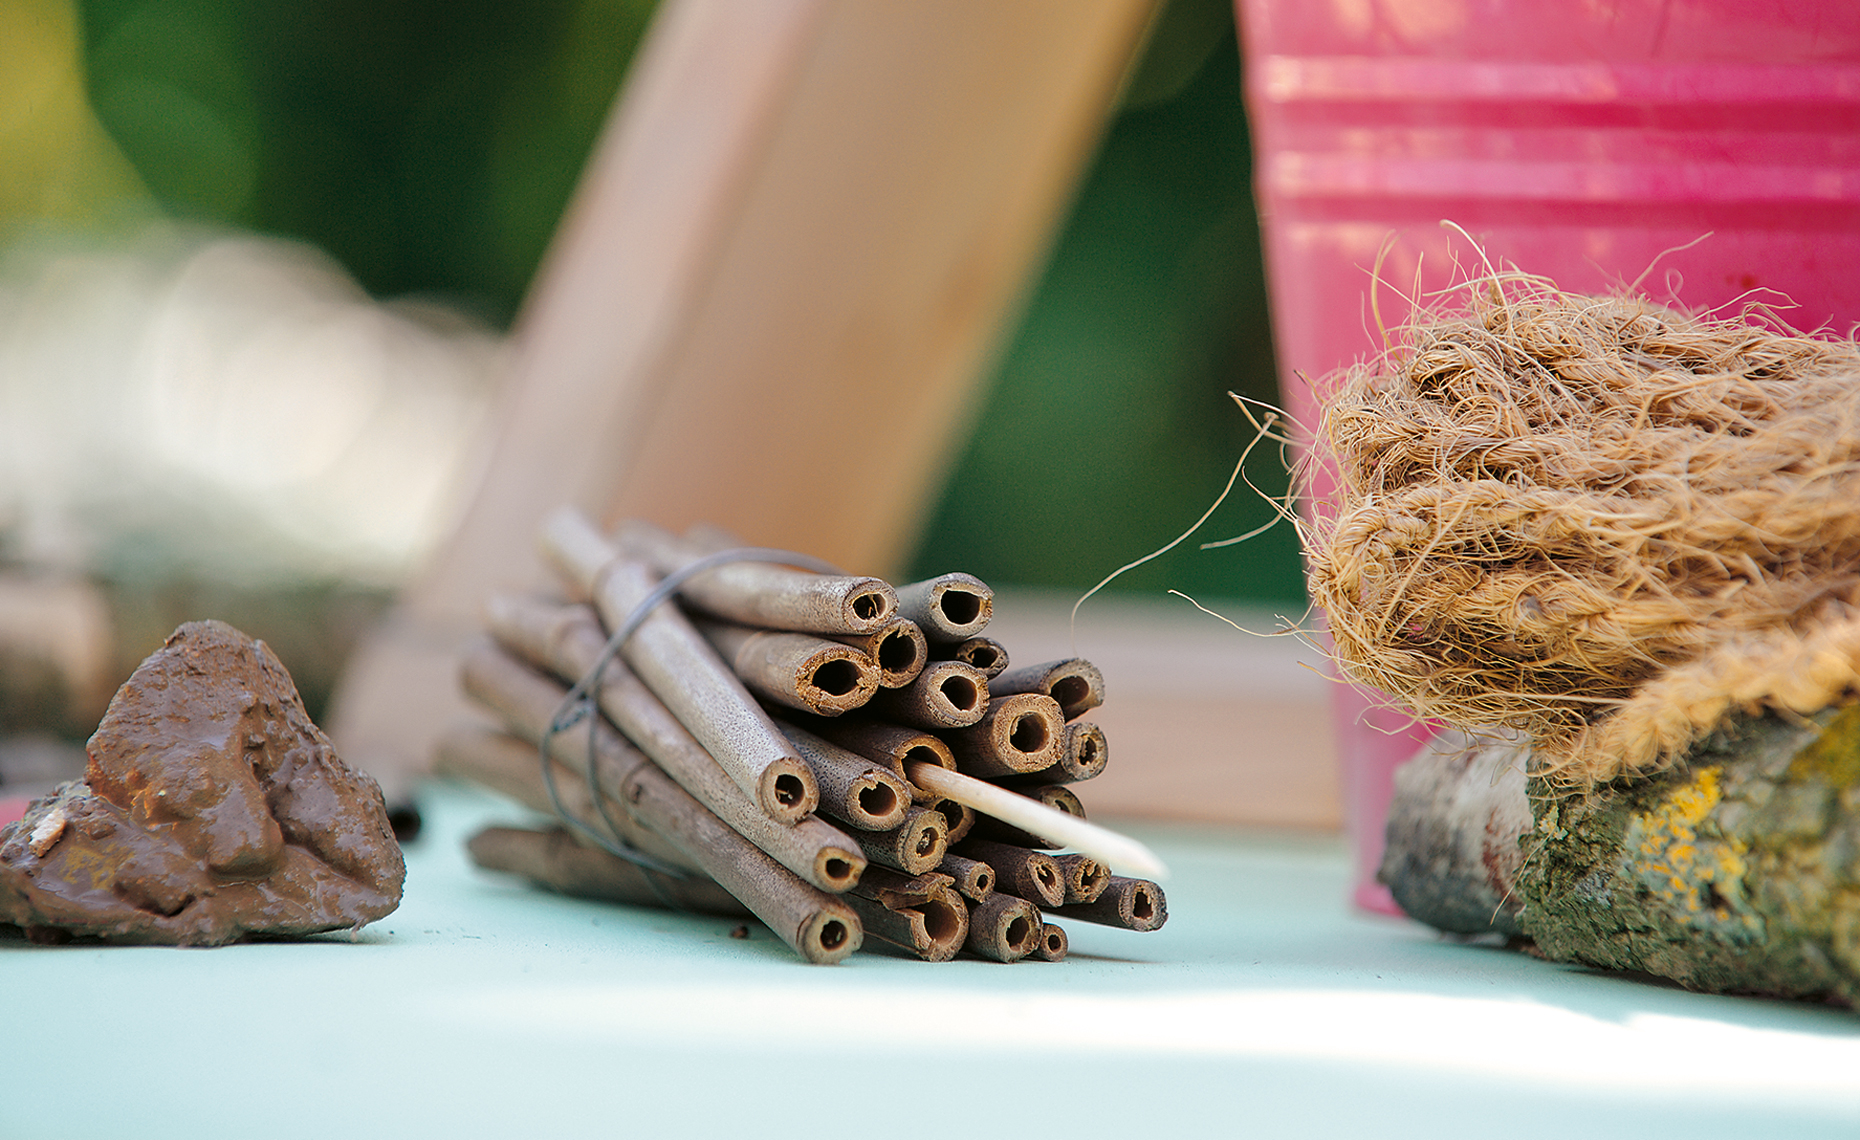 diy ideen insektenhotel himbeer familienmagazin. Black Bedroom Furniture Sets. Home Design Ideas